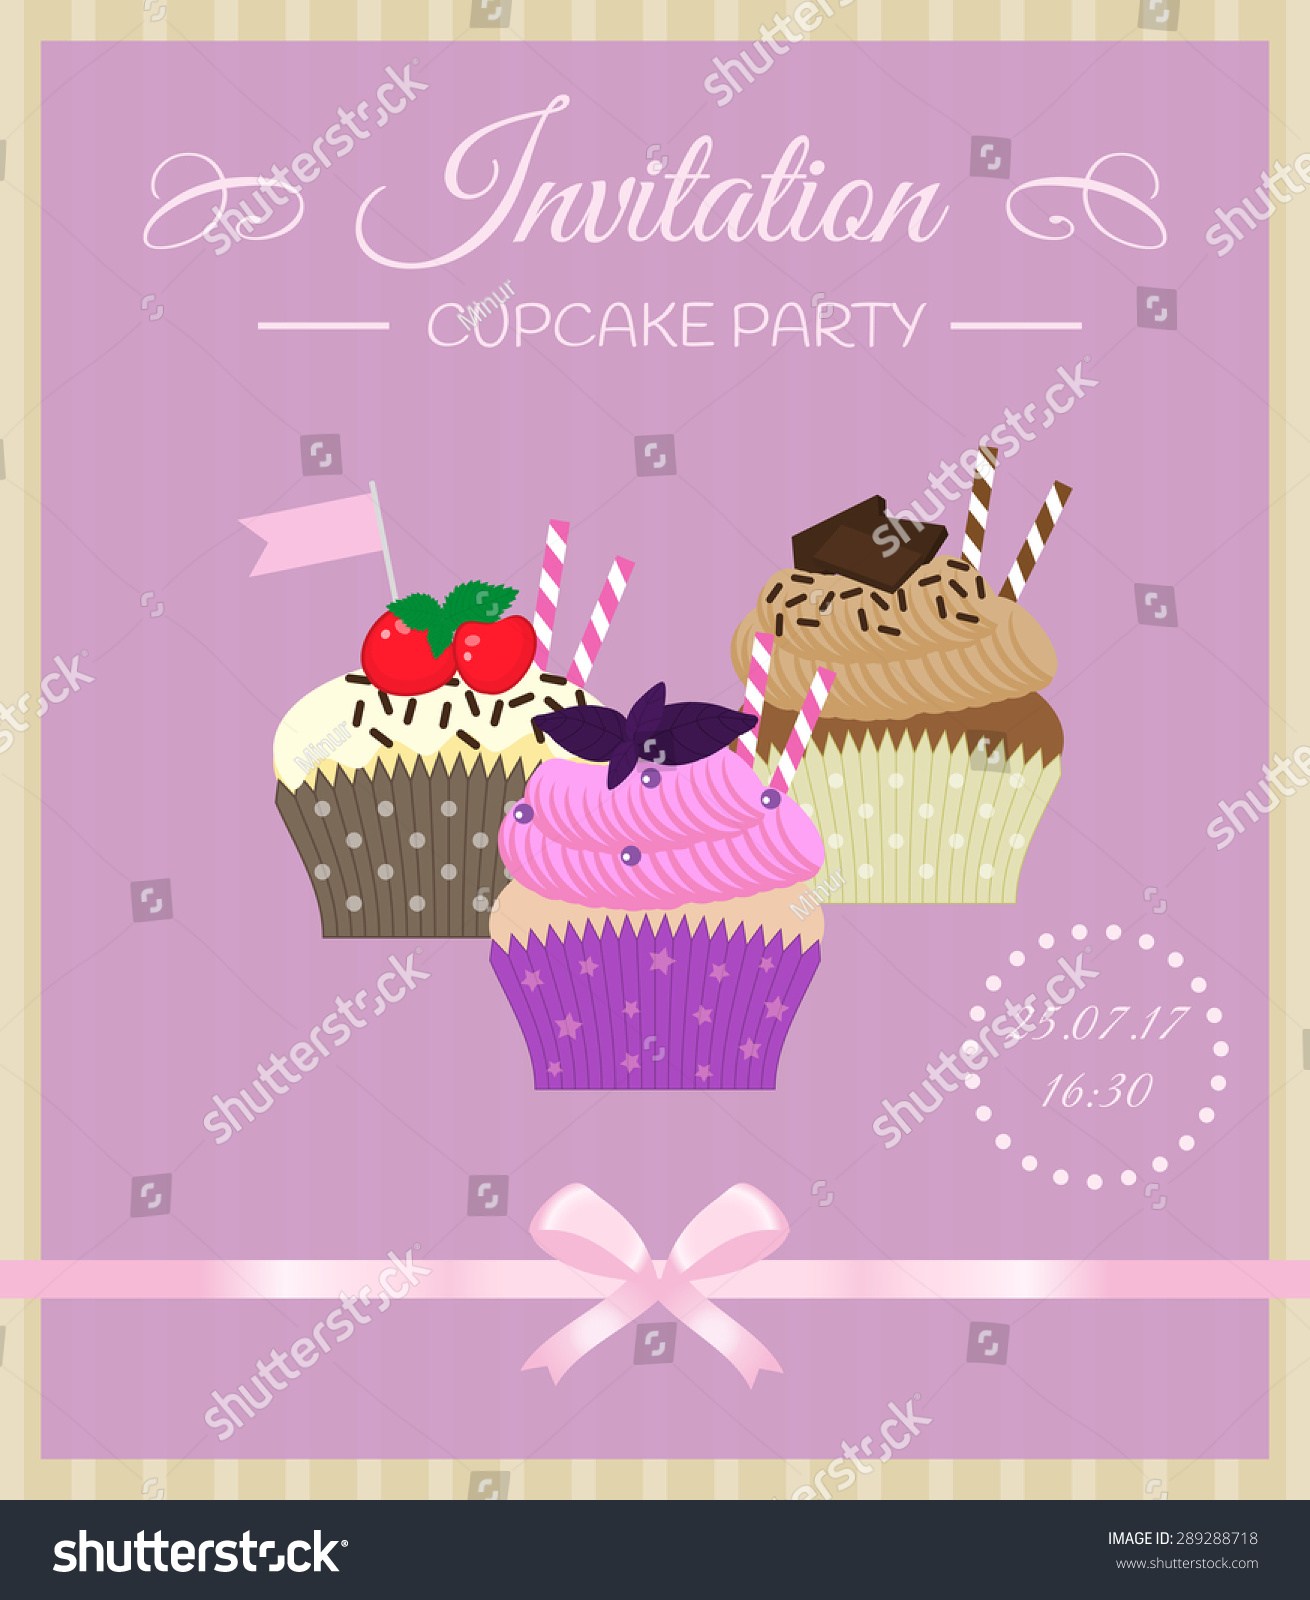 Cupcake Decorating Party Invitations ~ Instadecor.us